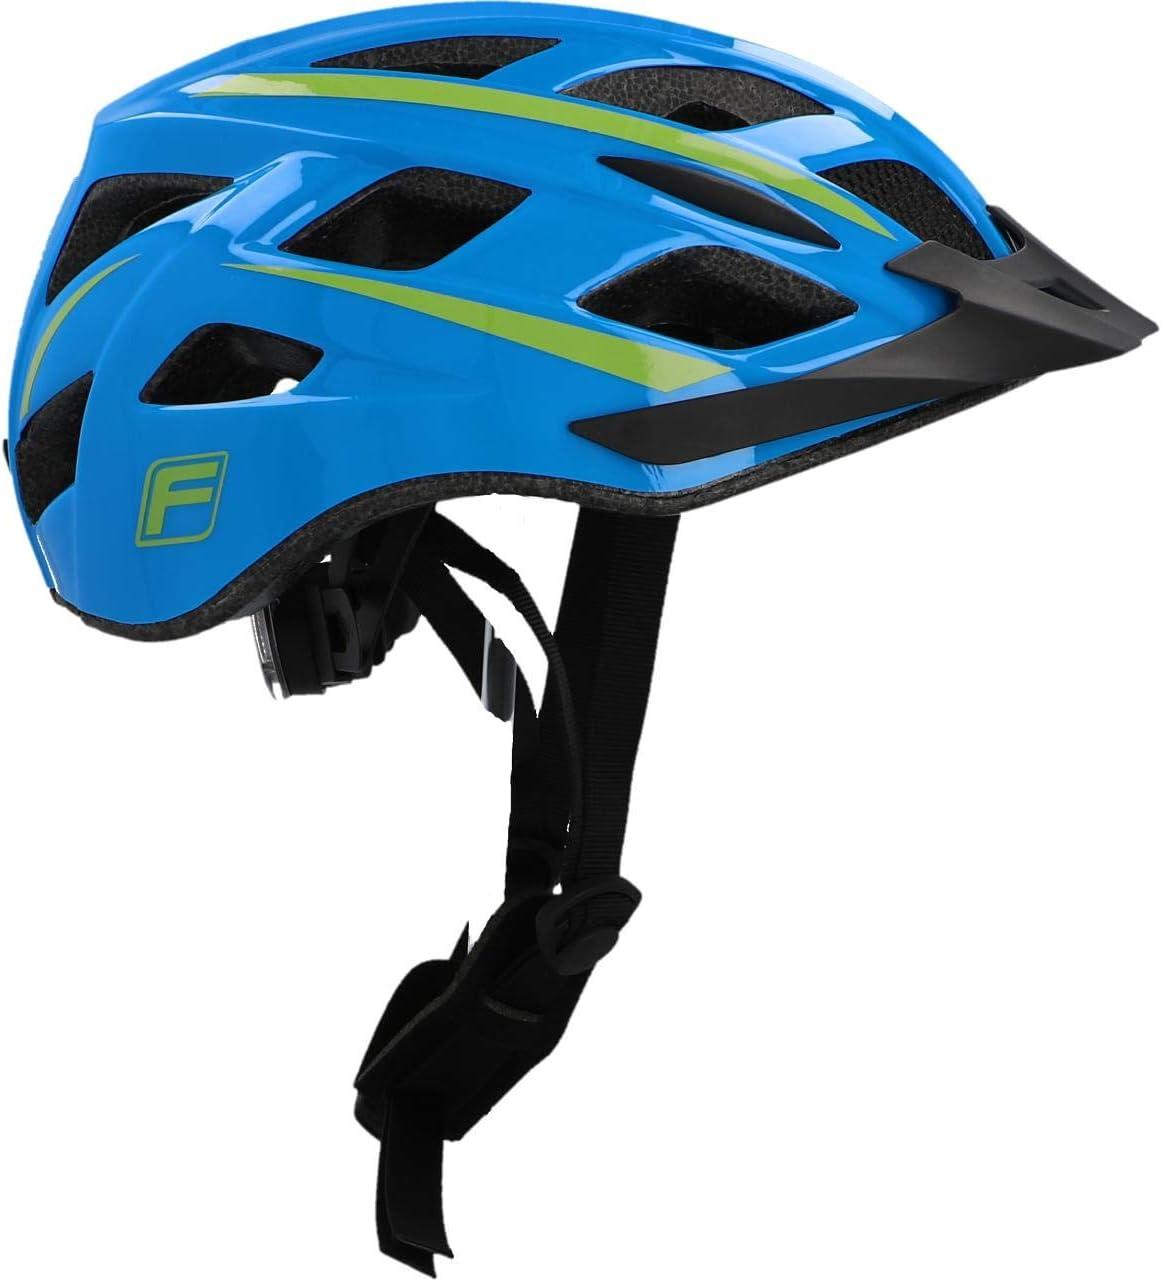 Small//Medium Fischer Fahrradhelm Casco de Bicicleta Azul